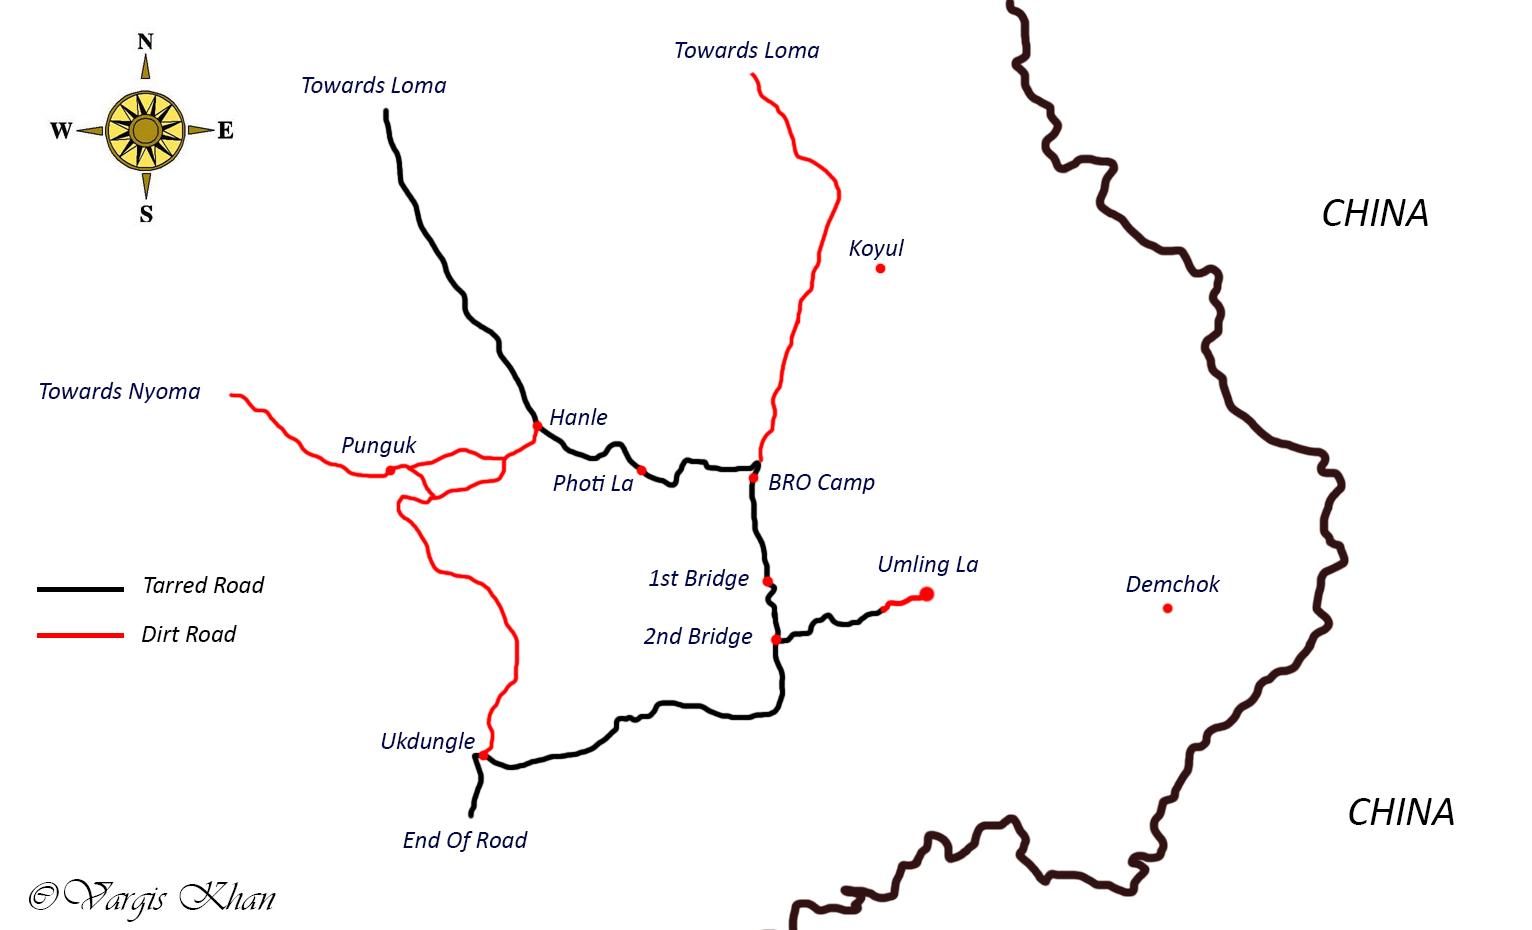 umling la road map